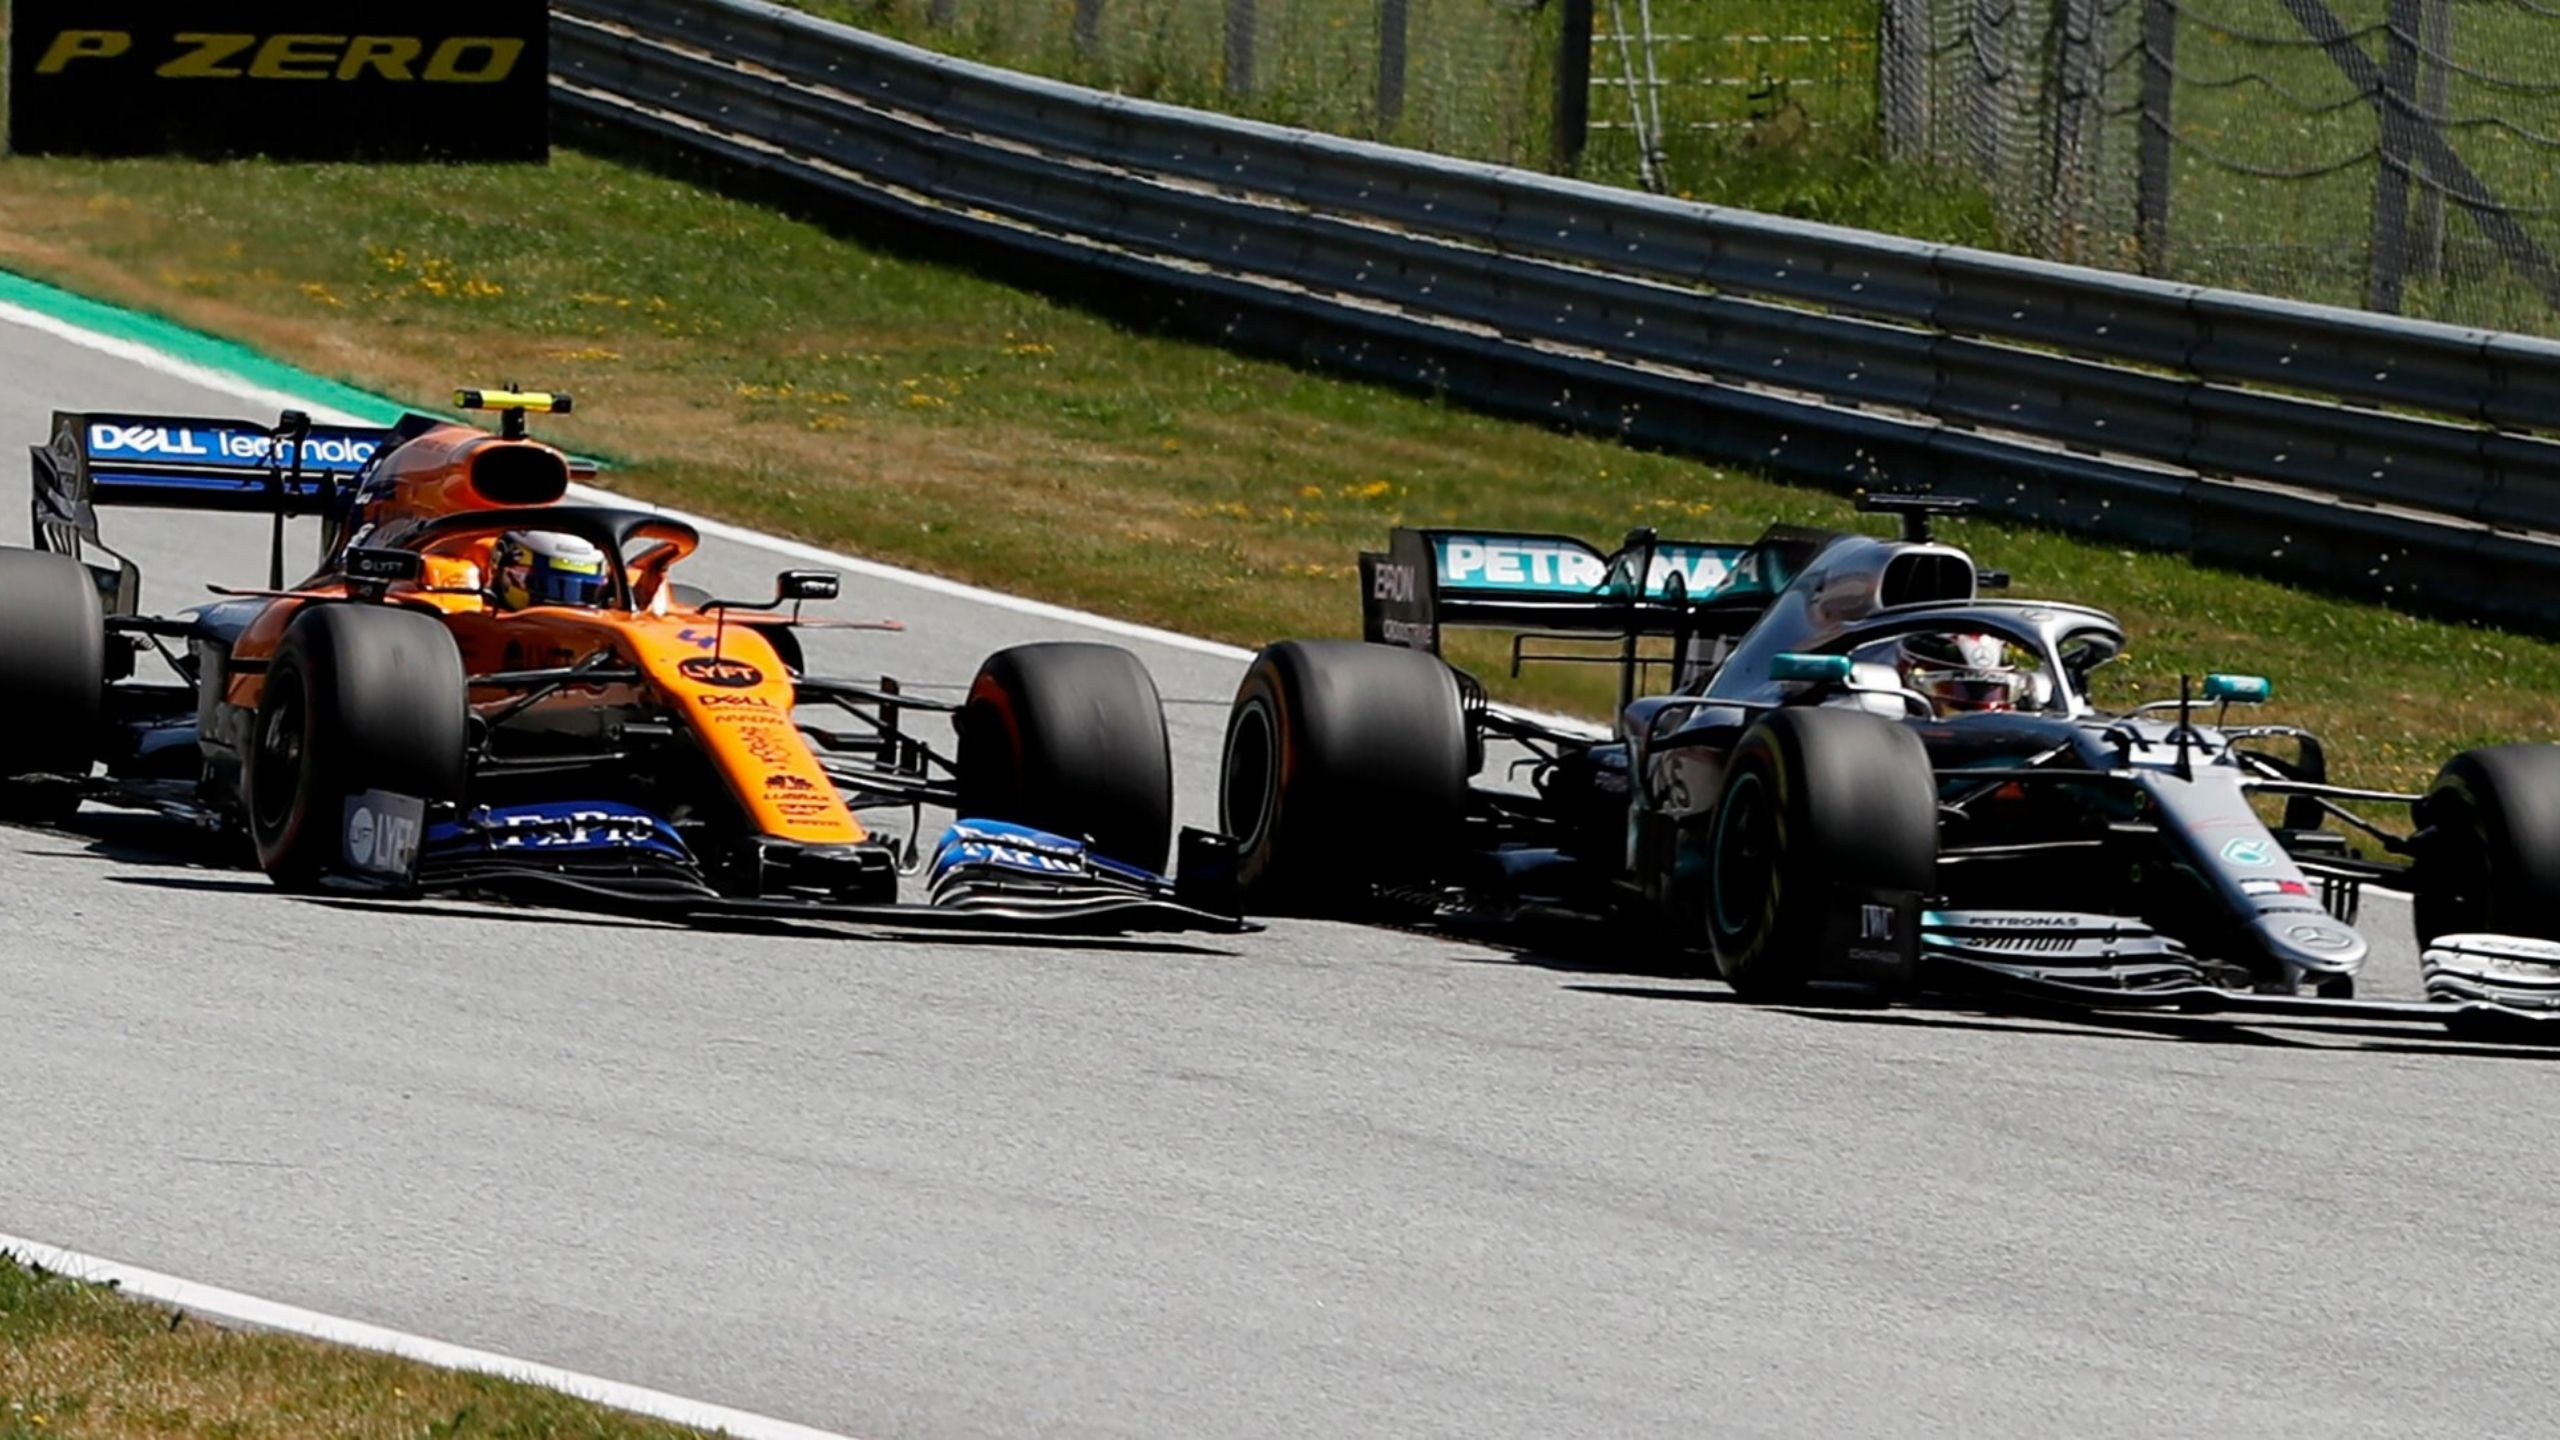 """Daniel is an experienced driver"" - McLaren boss Andreas Seidl has high hopes from Daniel Ricciardo and Mercedes reunion"